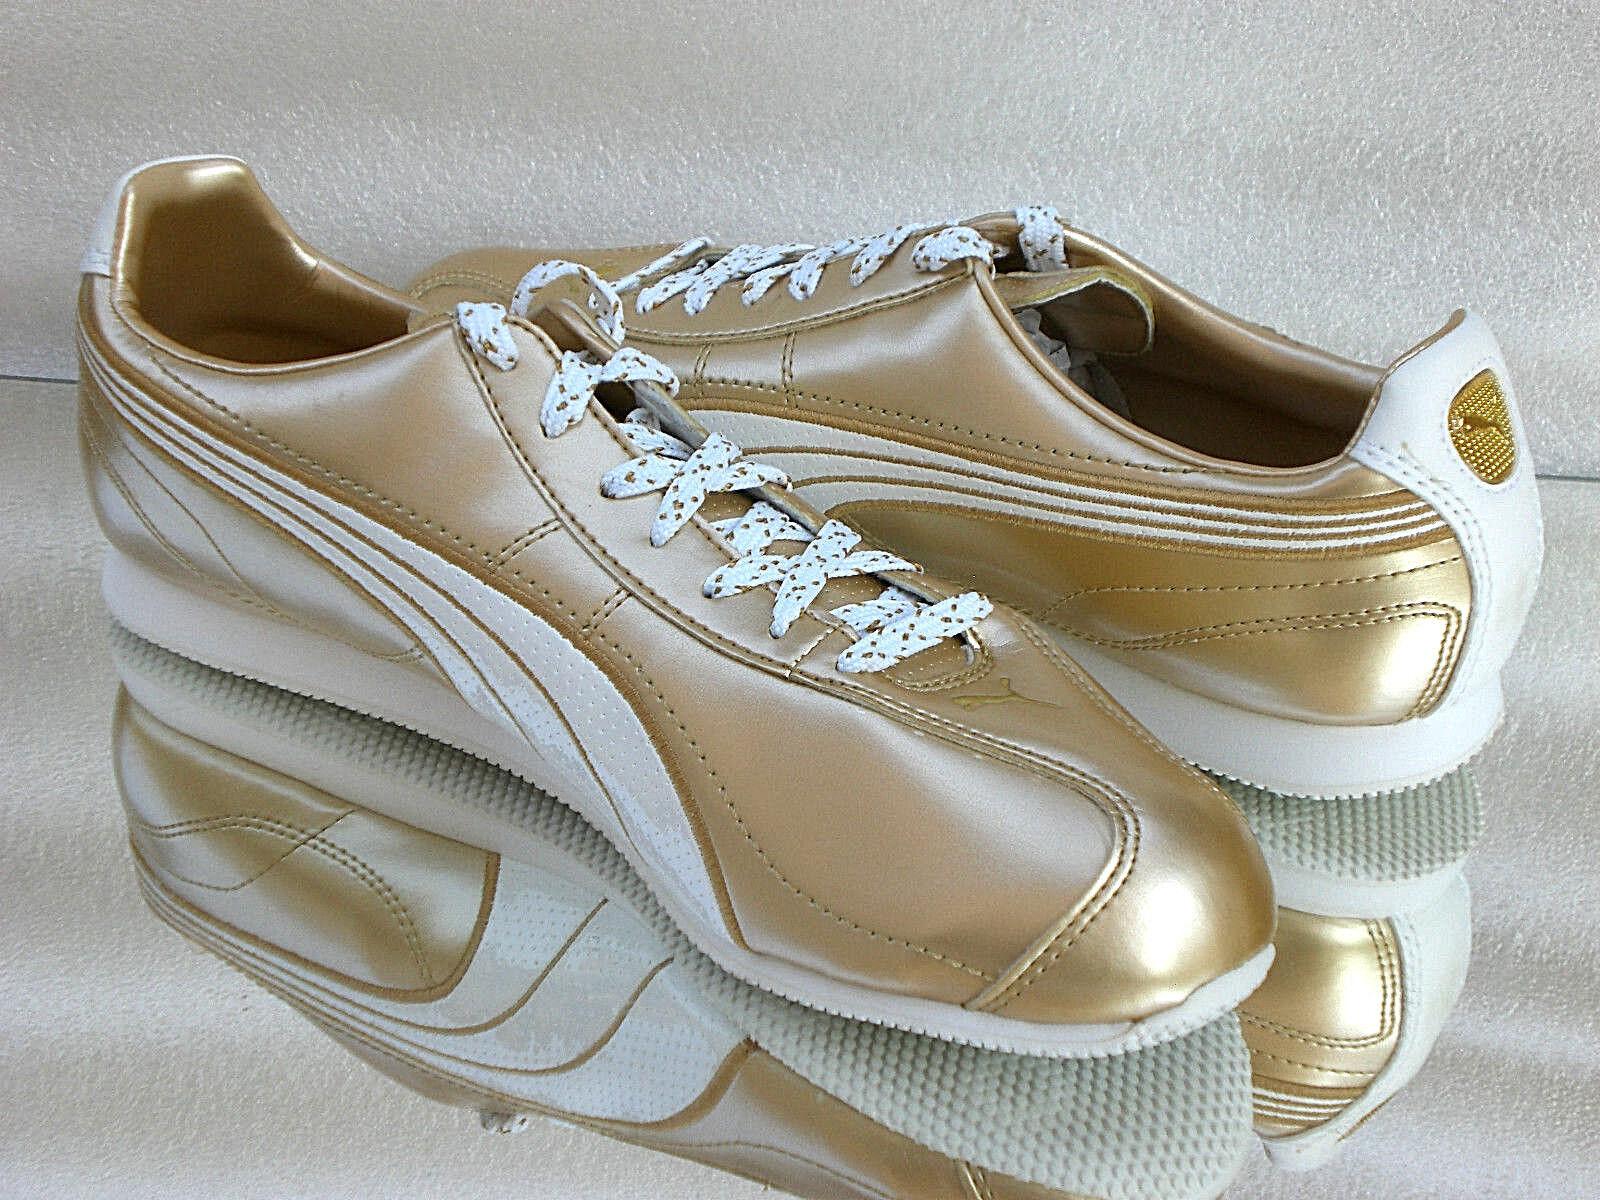 Puma Esito Metallic WP Gold-White Sneaker/Turnschuhe 349144 01 Größen 41-46 Neu